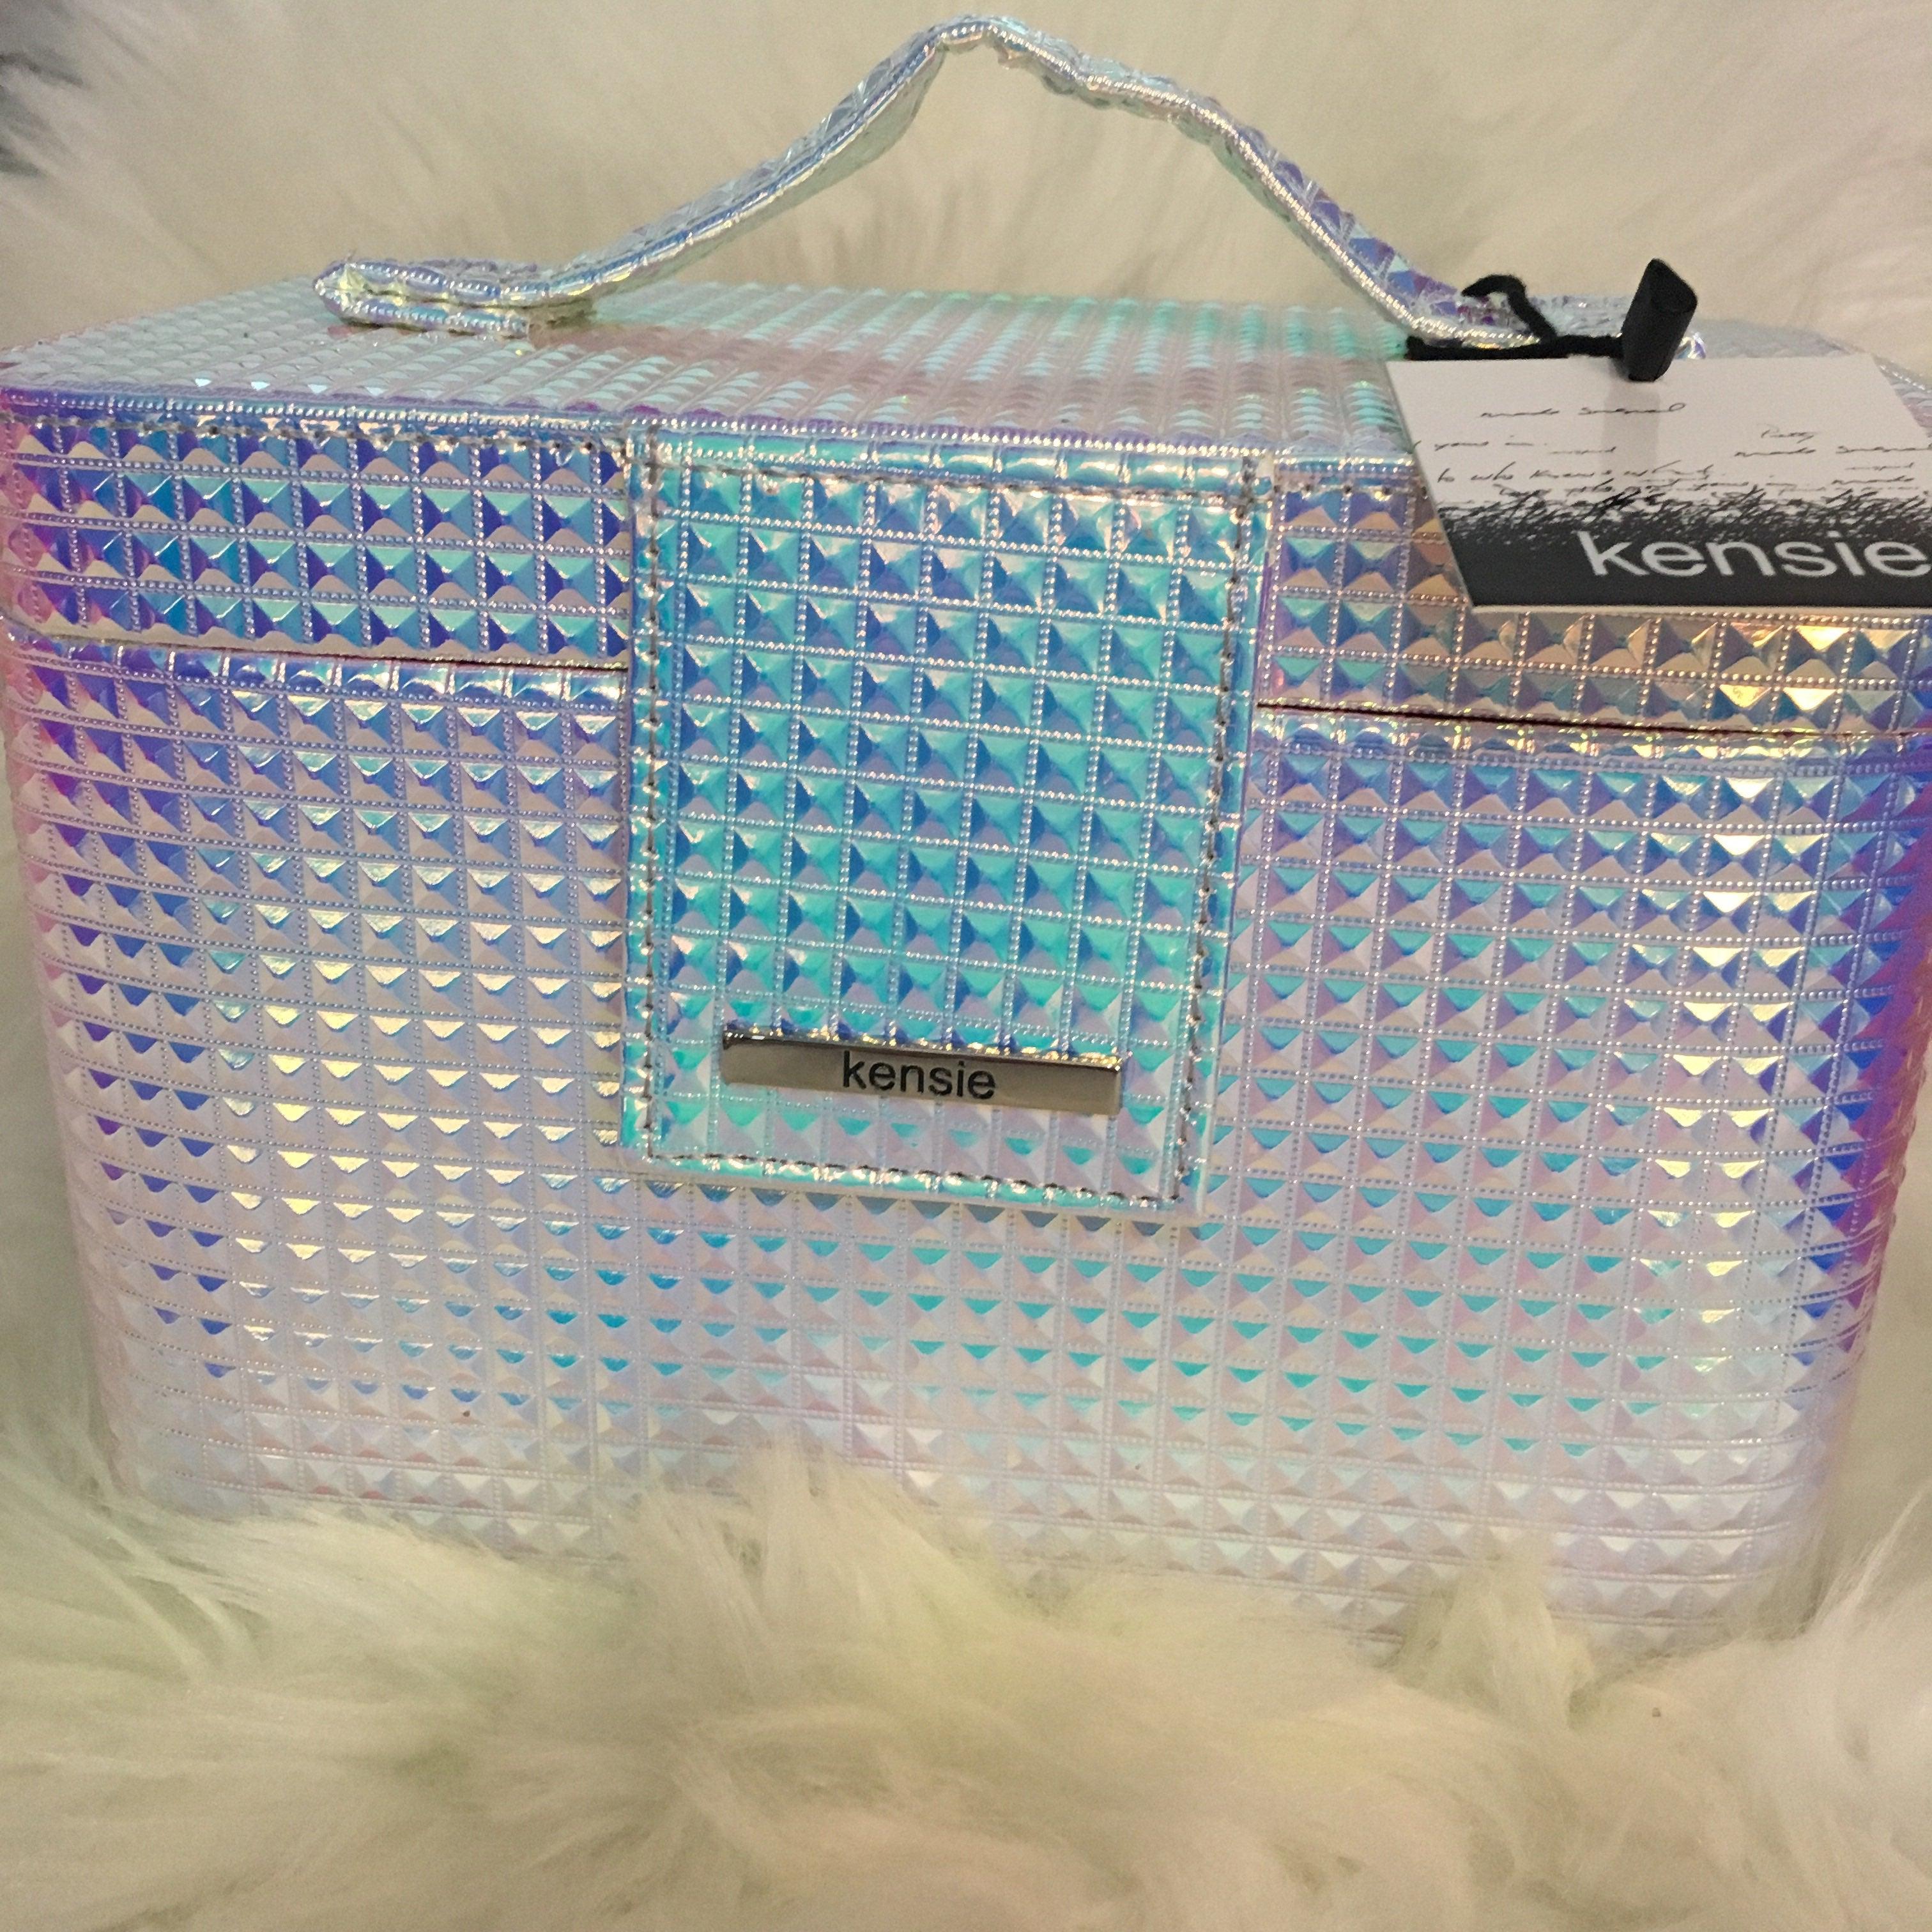 Holographic Iridescent Makeup Case